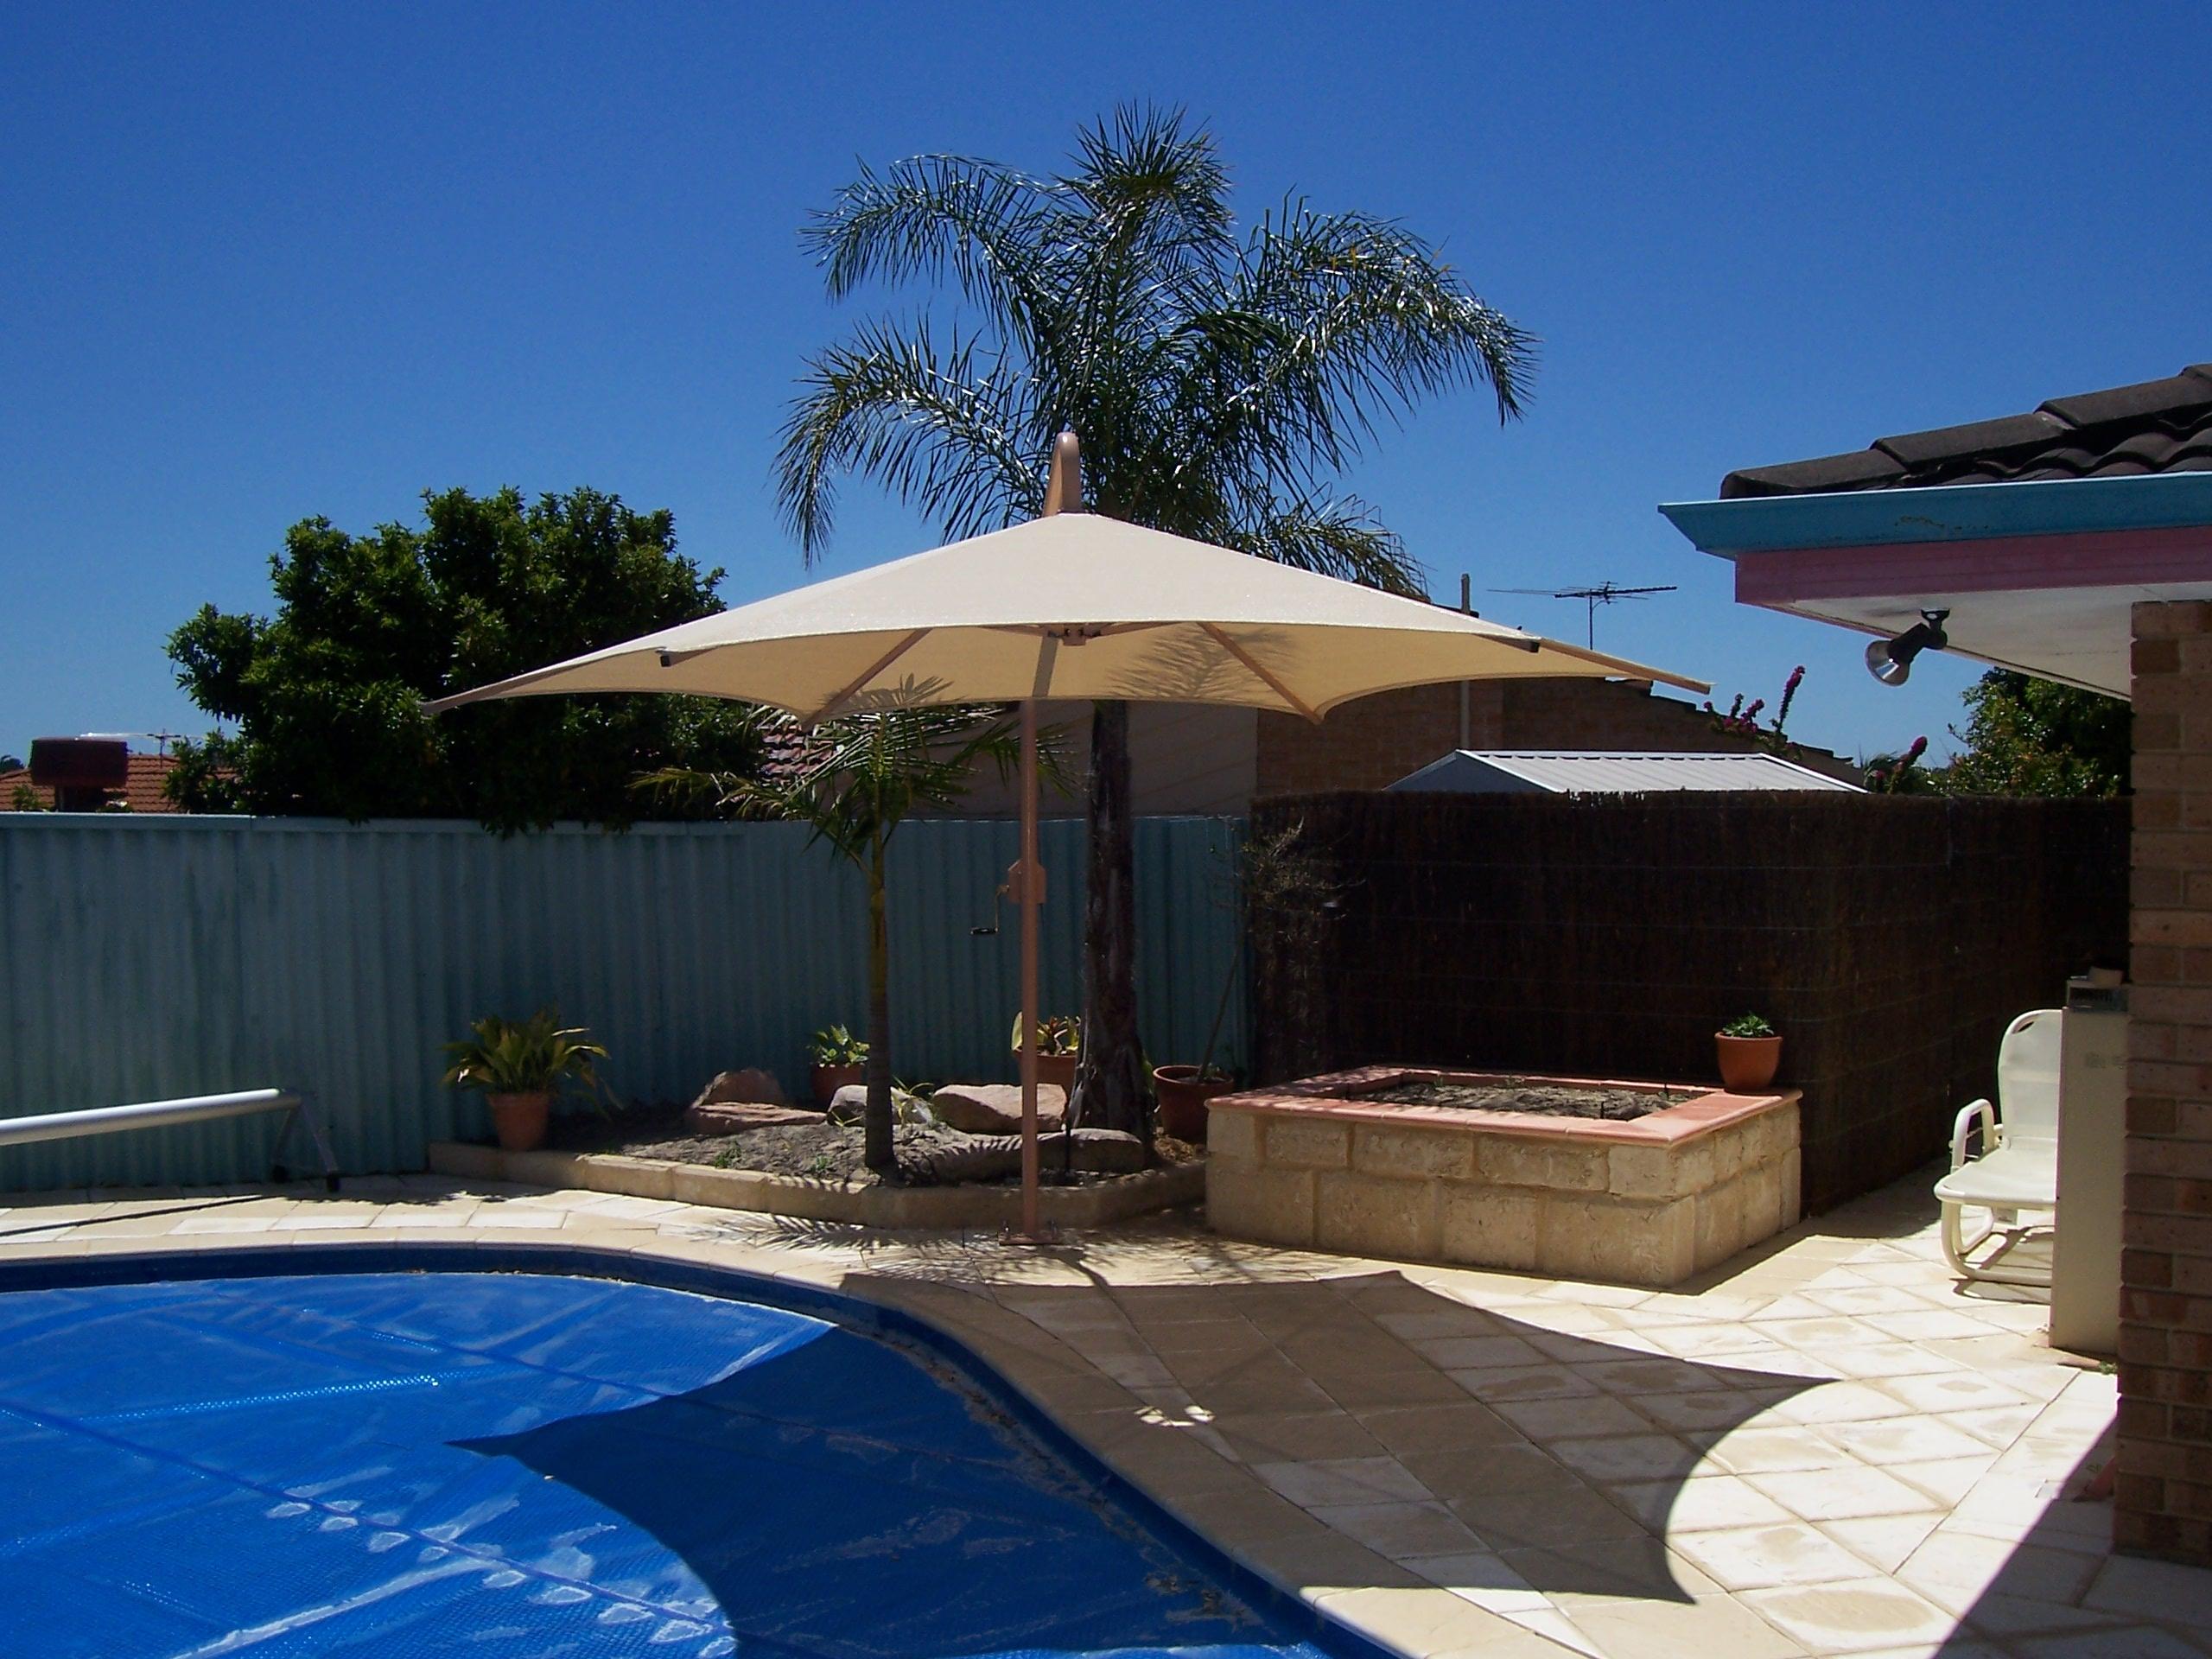 Umbrella Over Sandpit Photo S 004 100 0754 0745 0421